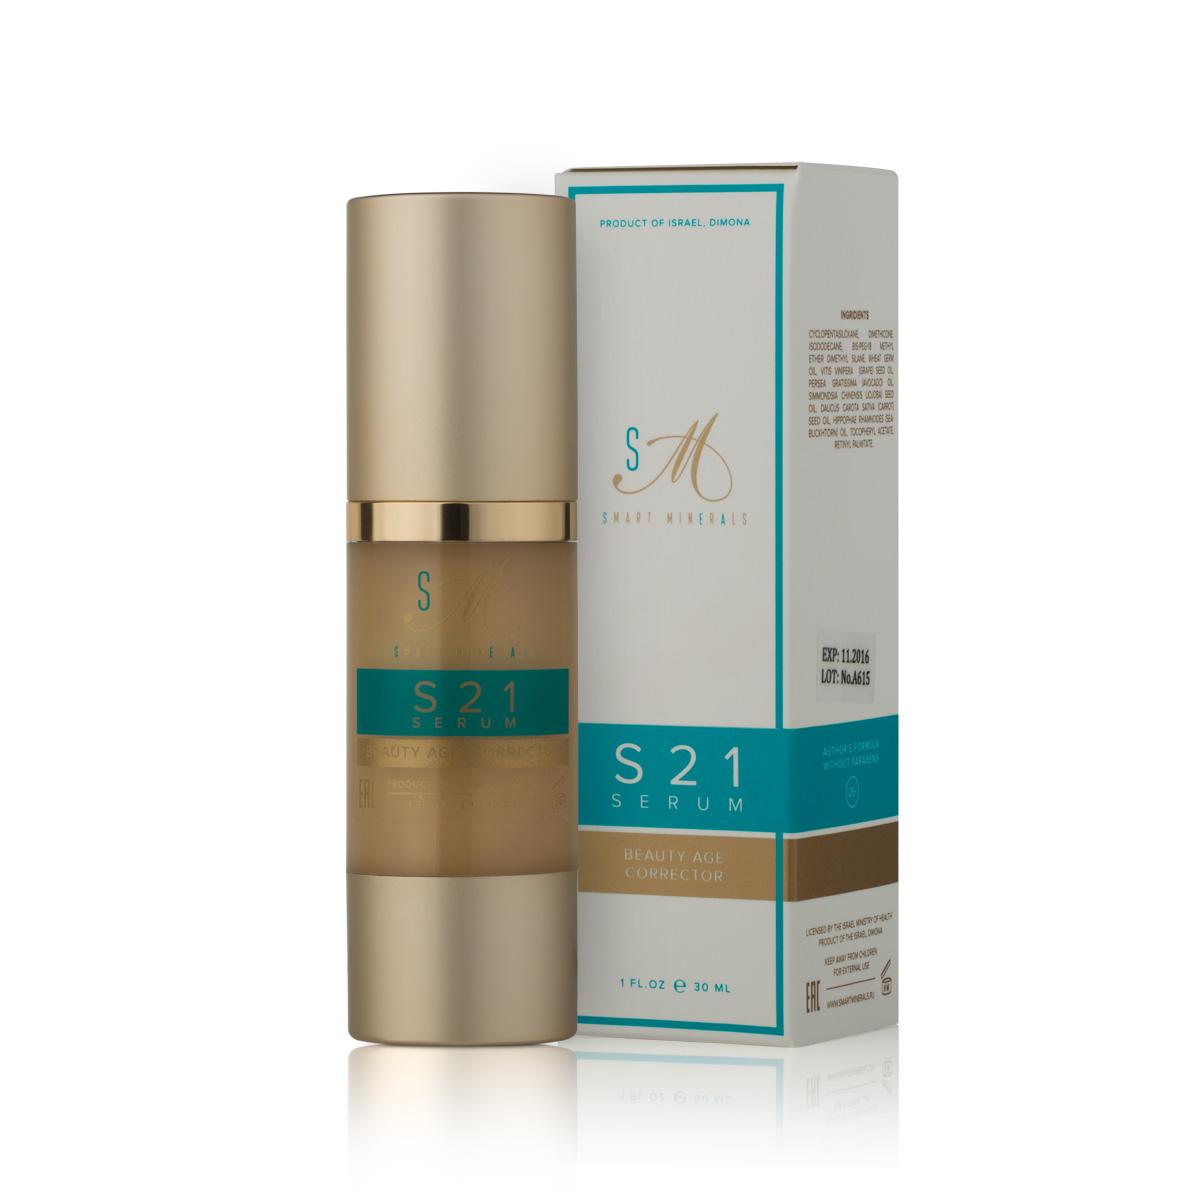 SMART MINERALS Сыворотка эфективно-антивозрастная / Beauty age corrector 30мл